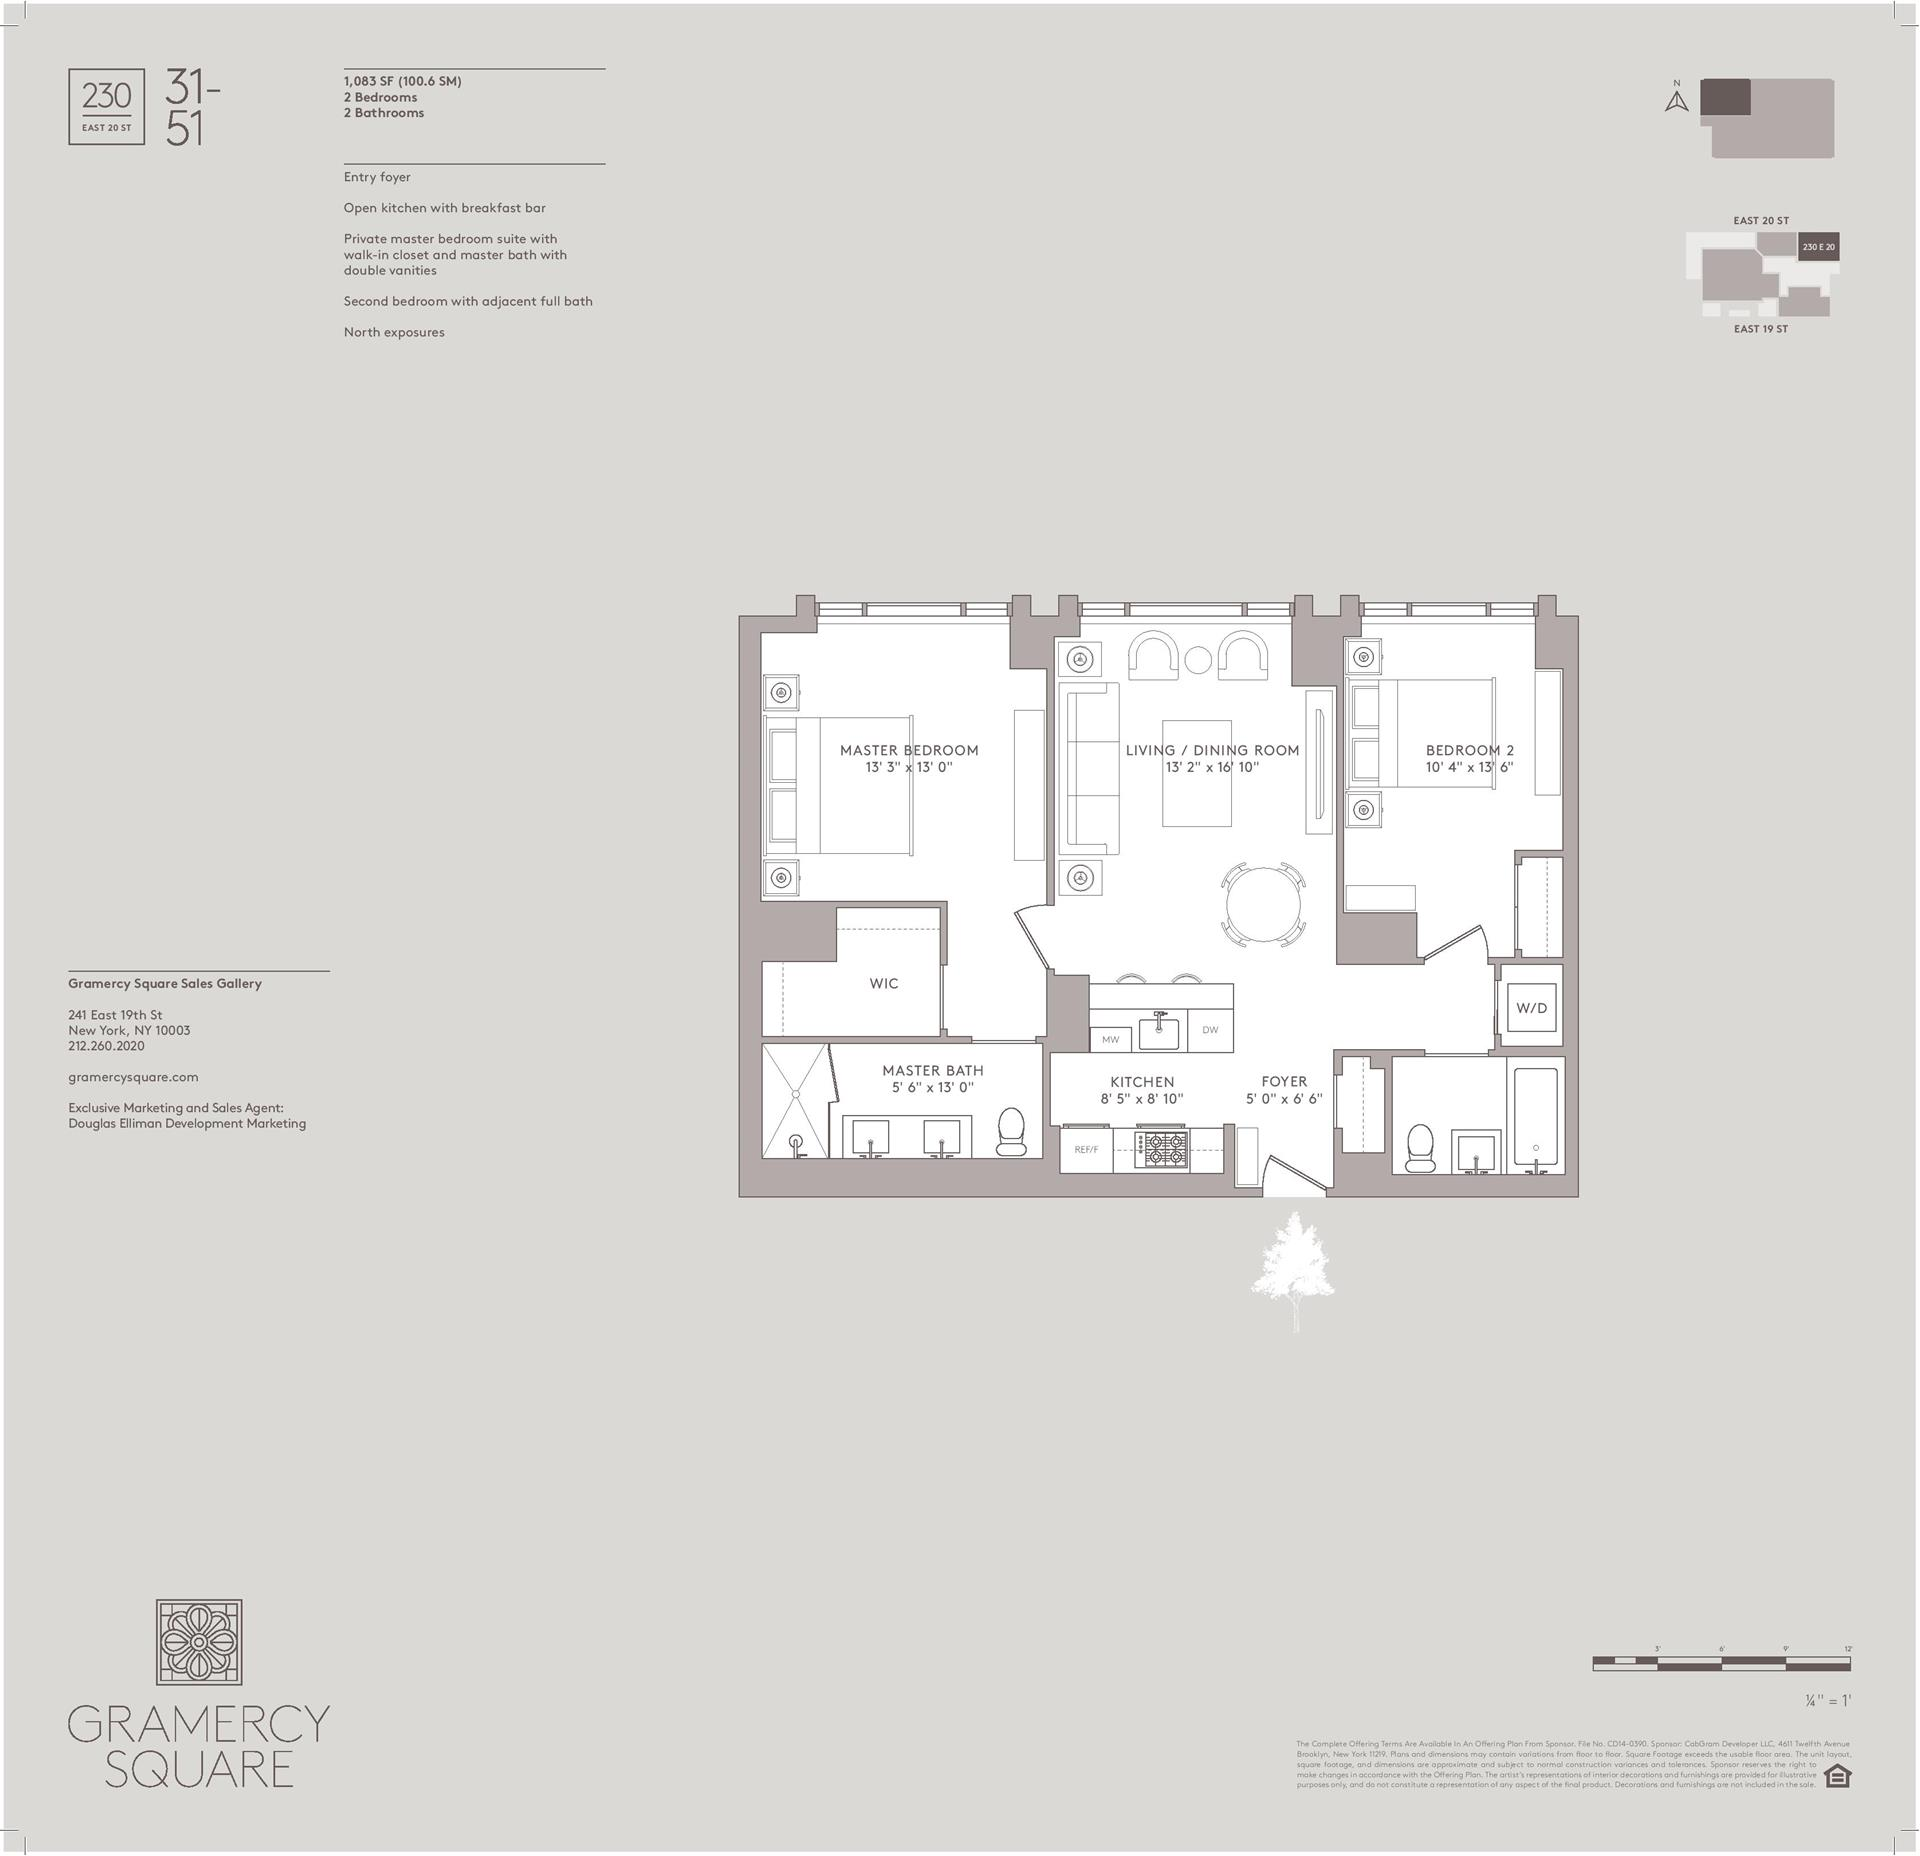 Floor plan of Gramercy Square, 230 East 20th Street, 31 - Gramercy - Union Square, New York